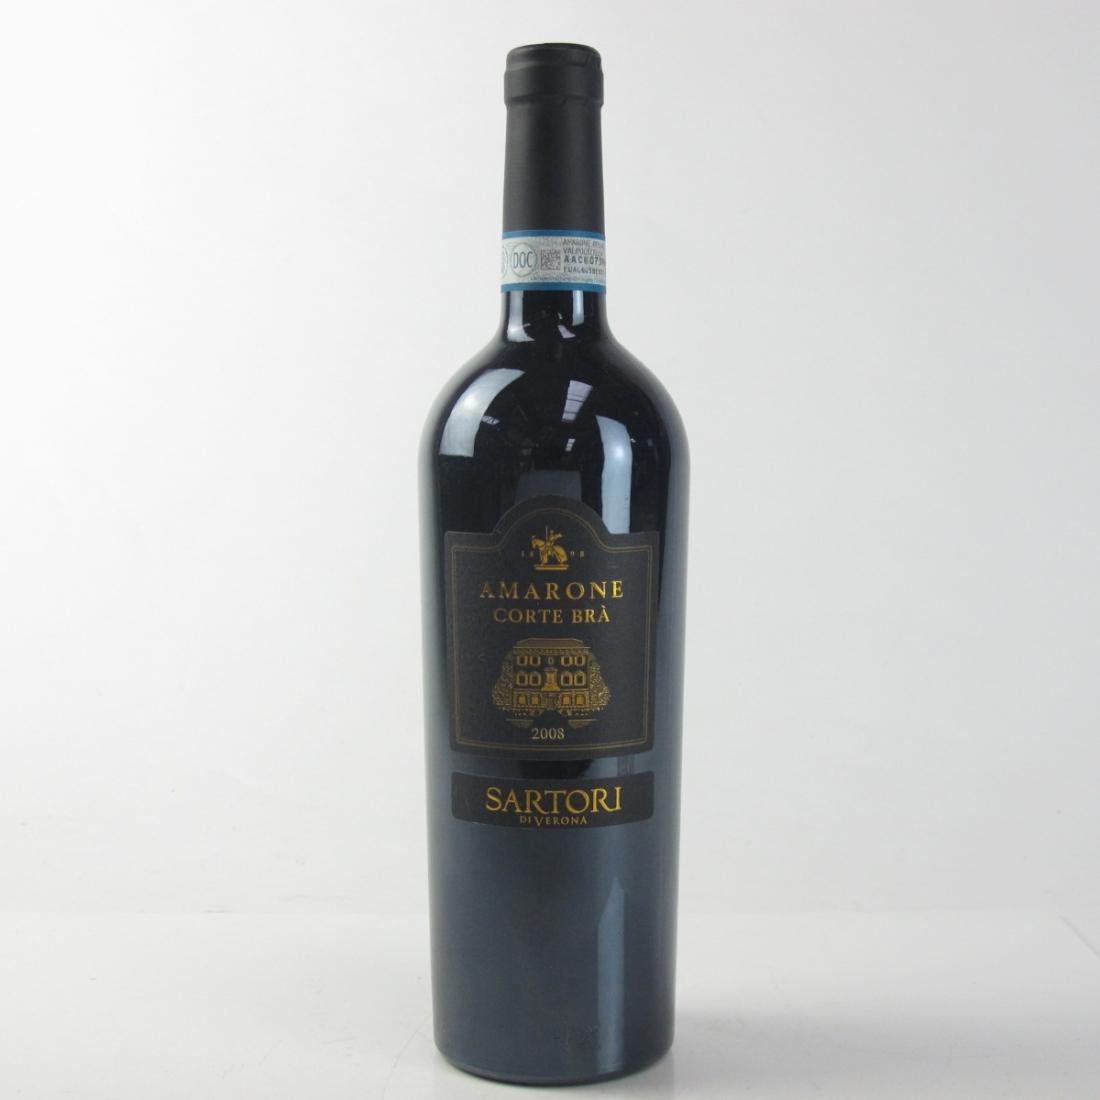 Sartori 2008 Amarone